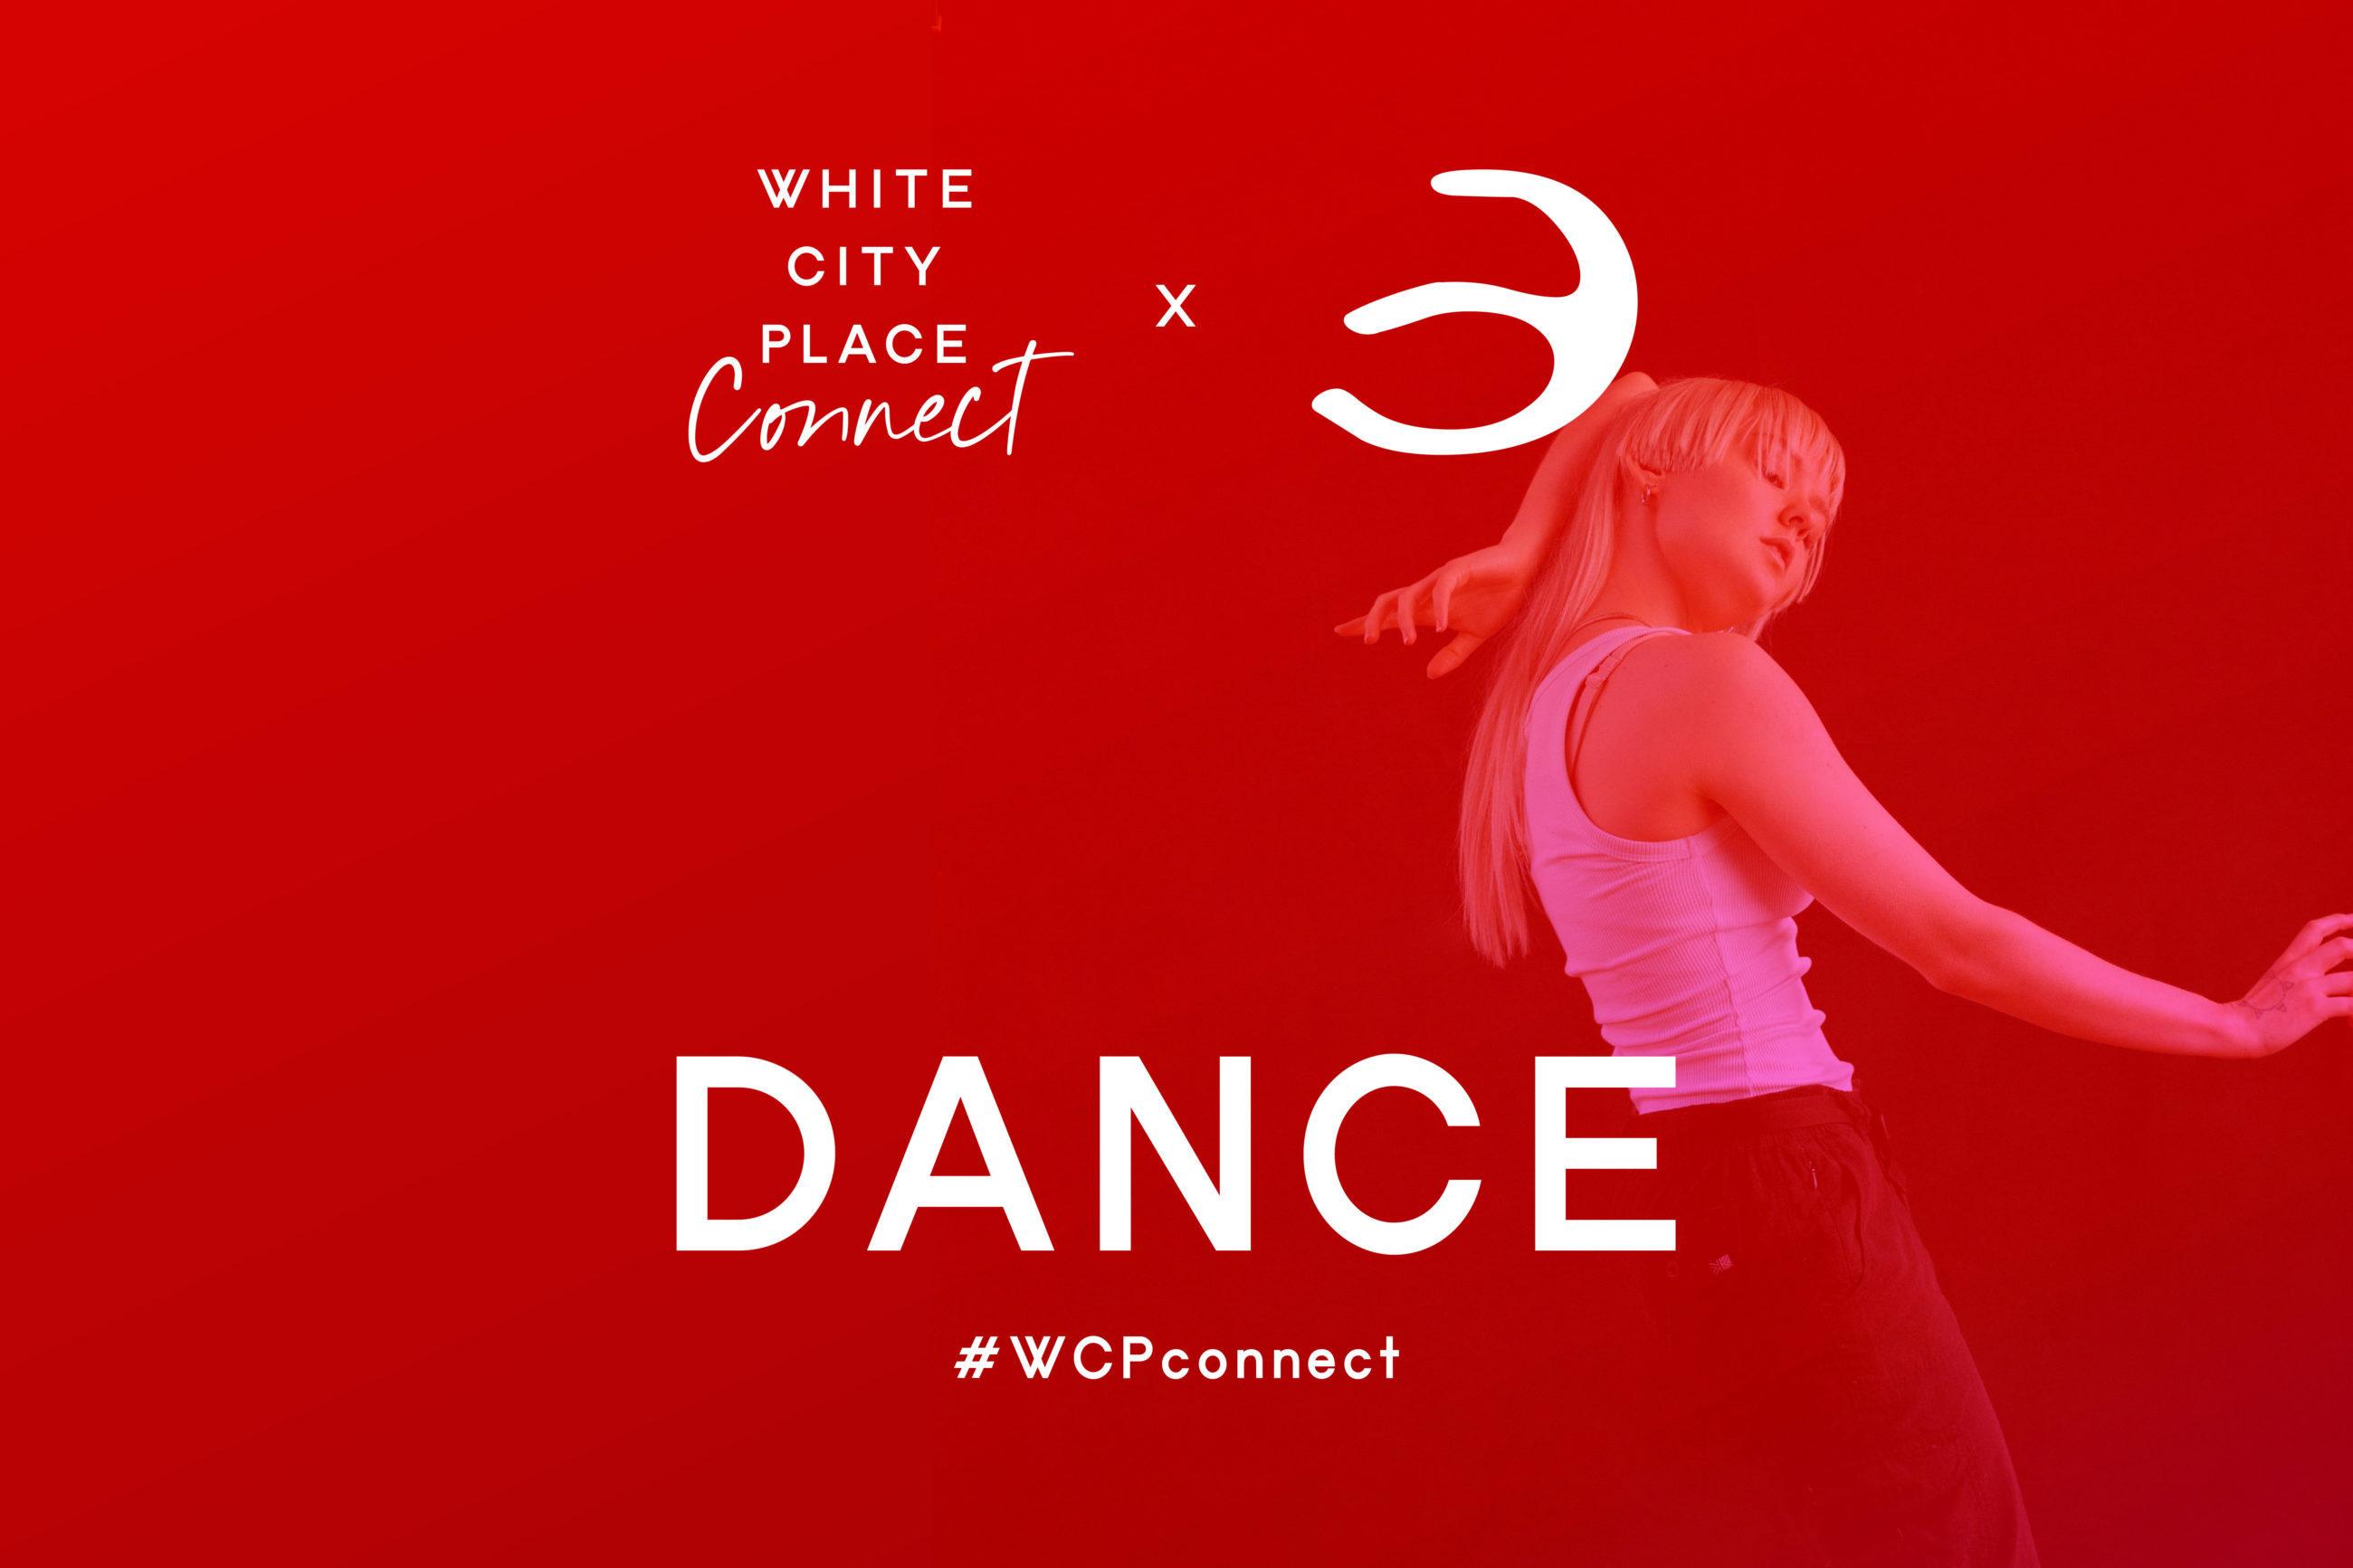 White City Place Connect: Dance Feature Image